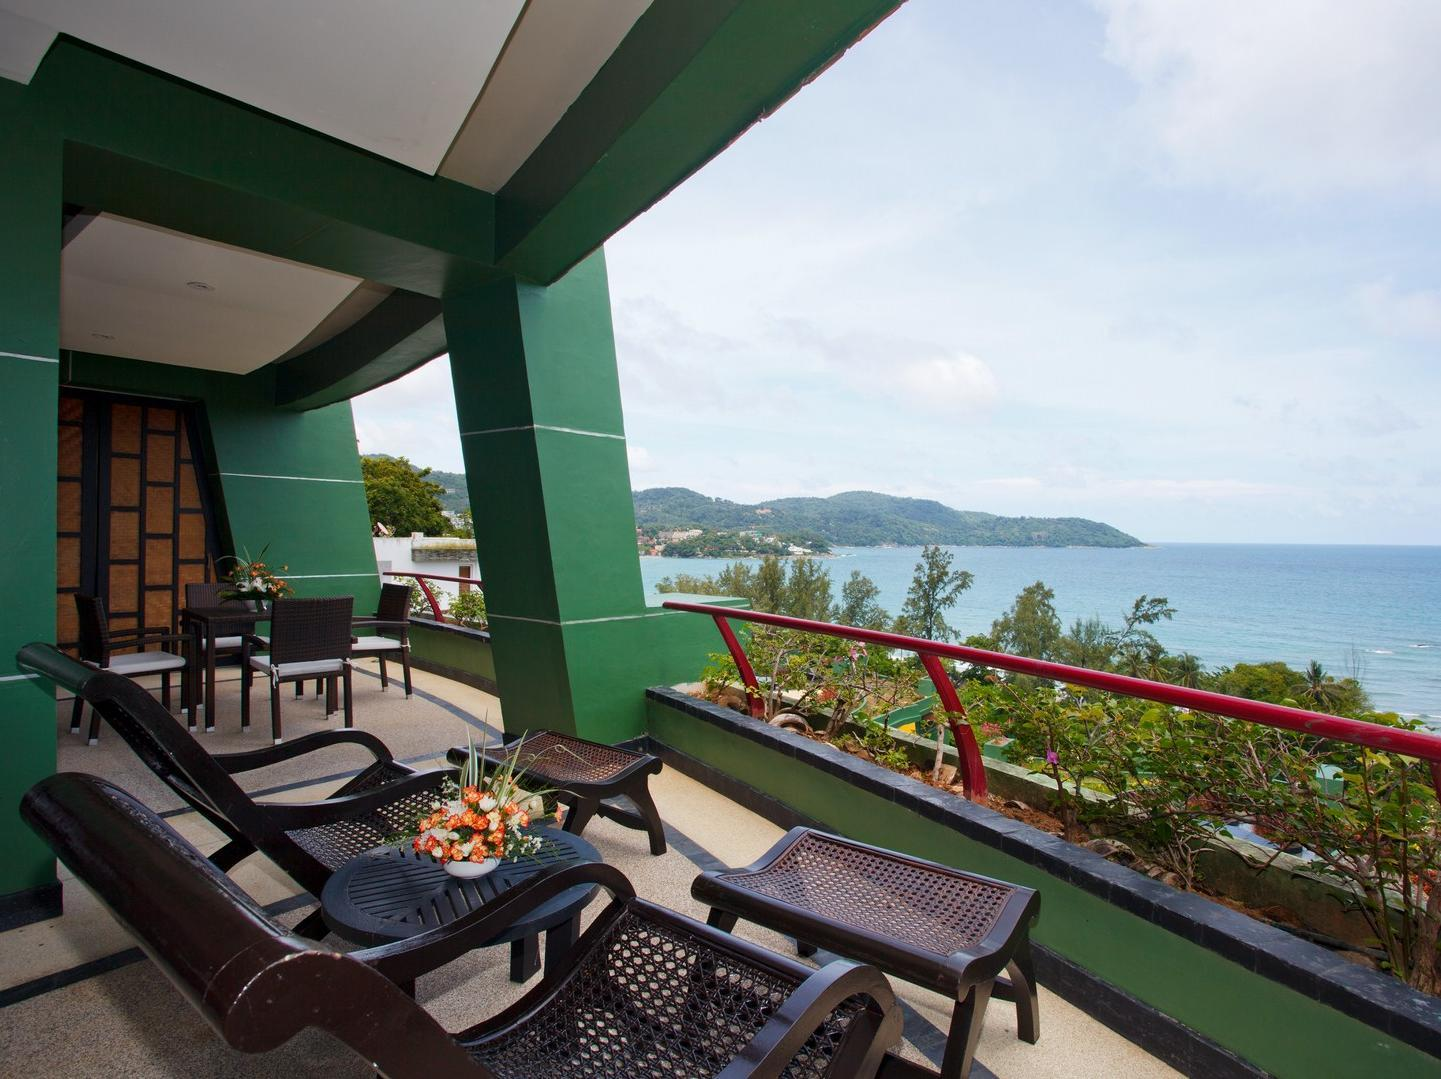 The Aspasia Hotel Phuket